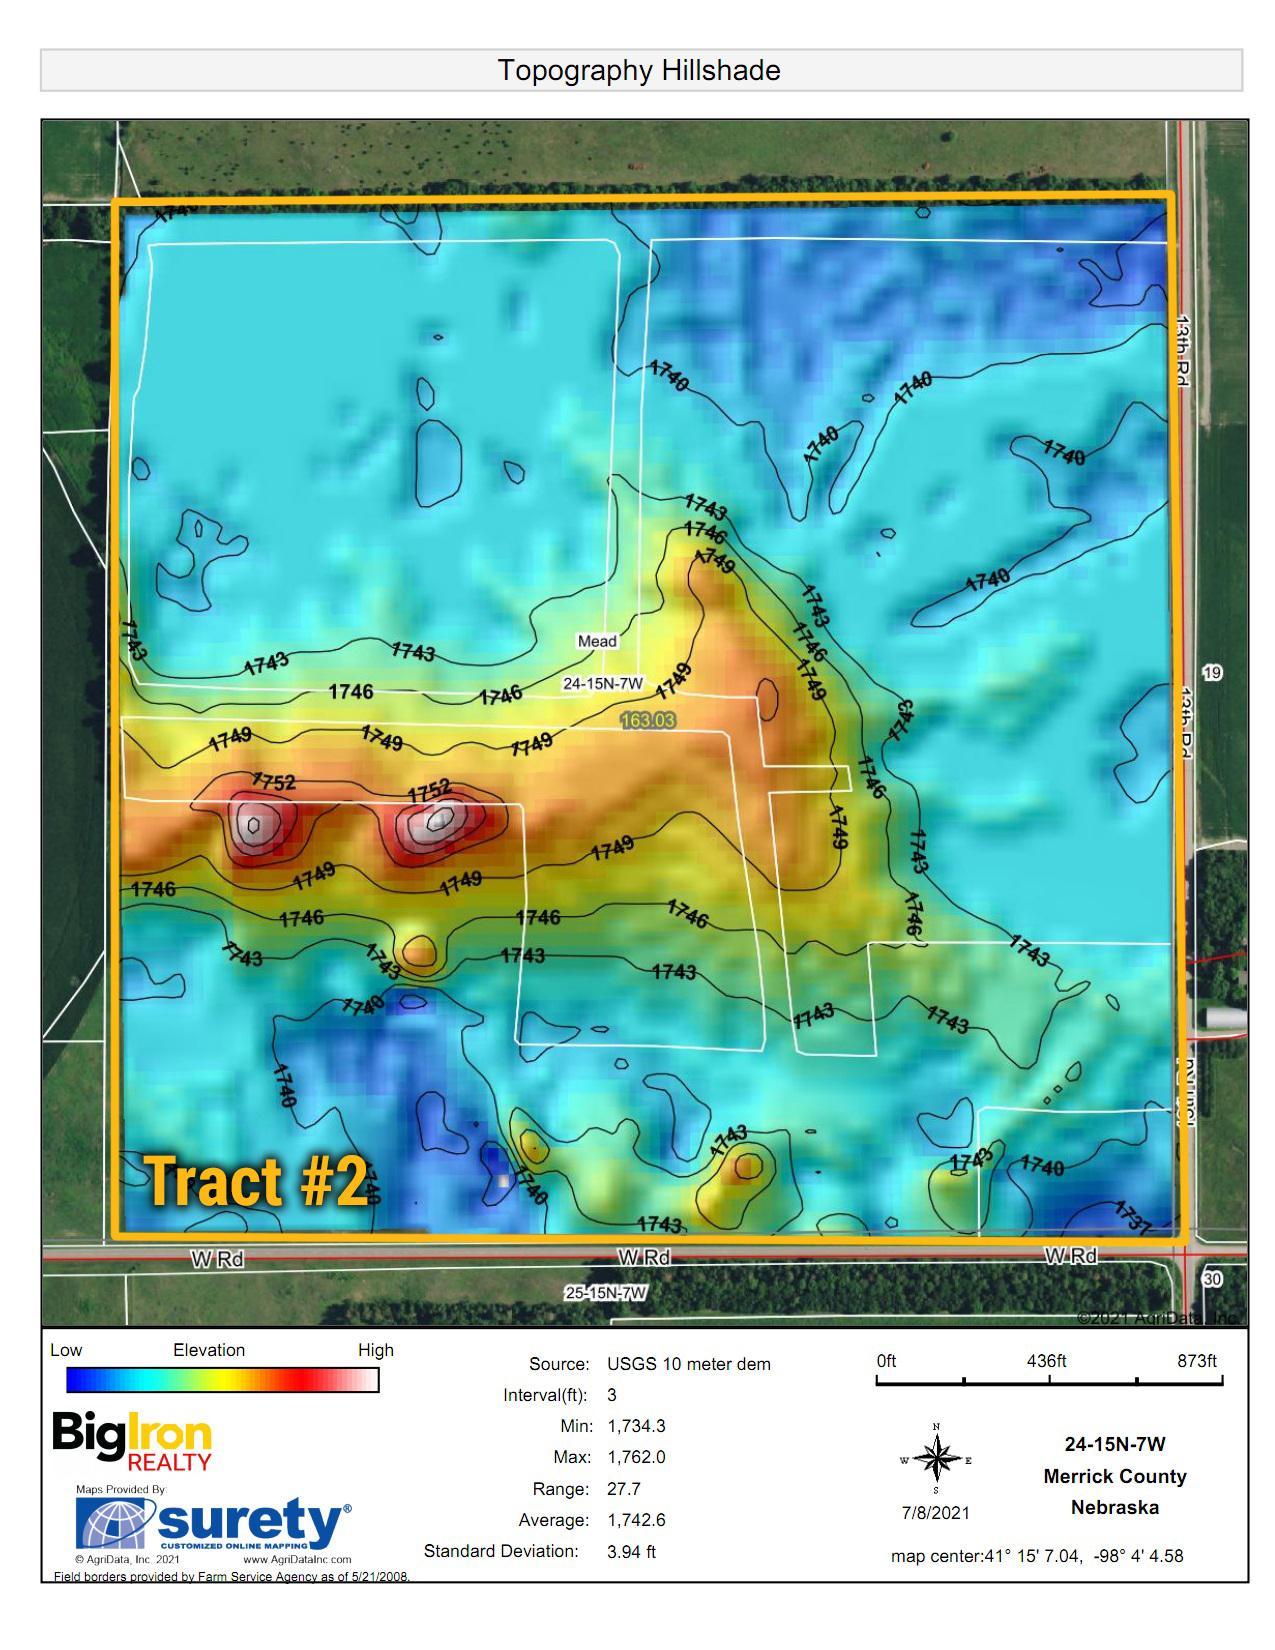 2 Topography Hillshade_BIR-2129